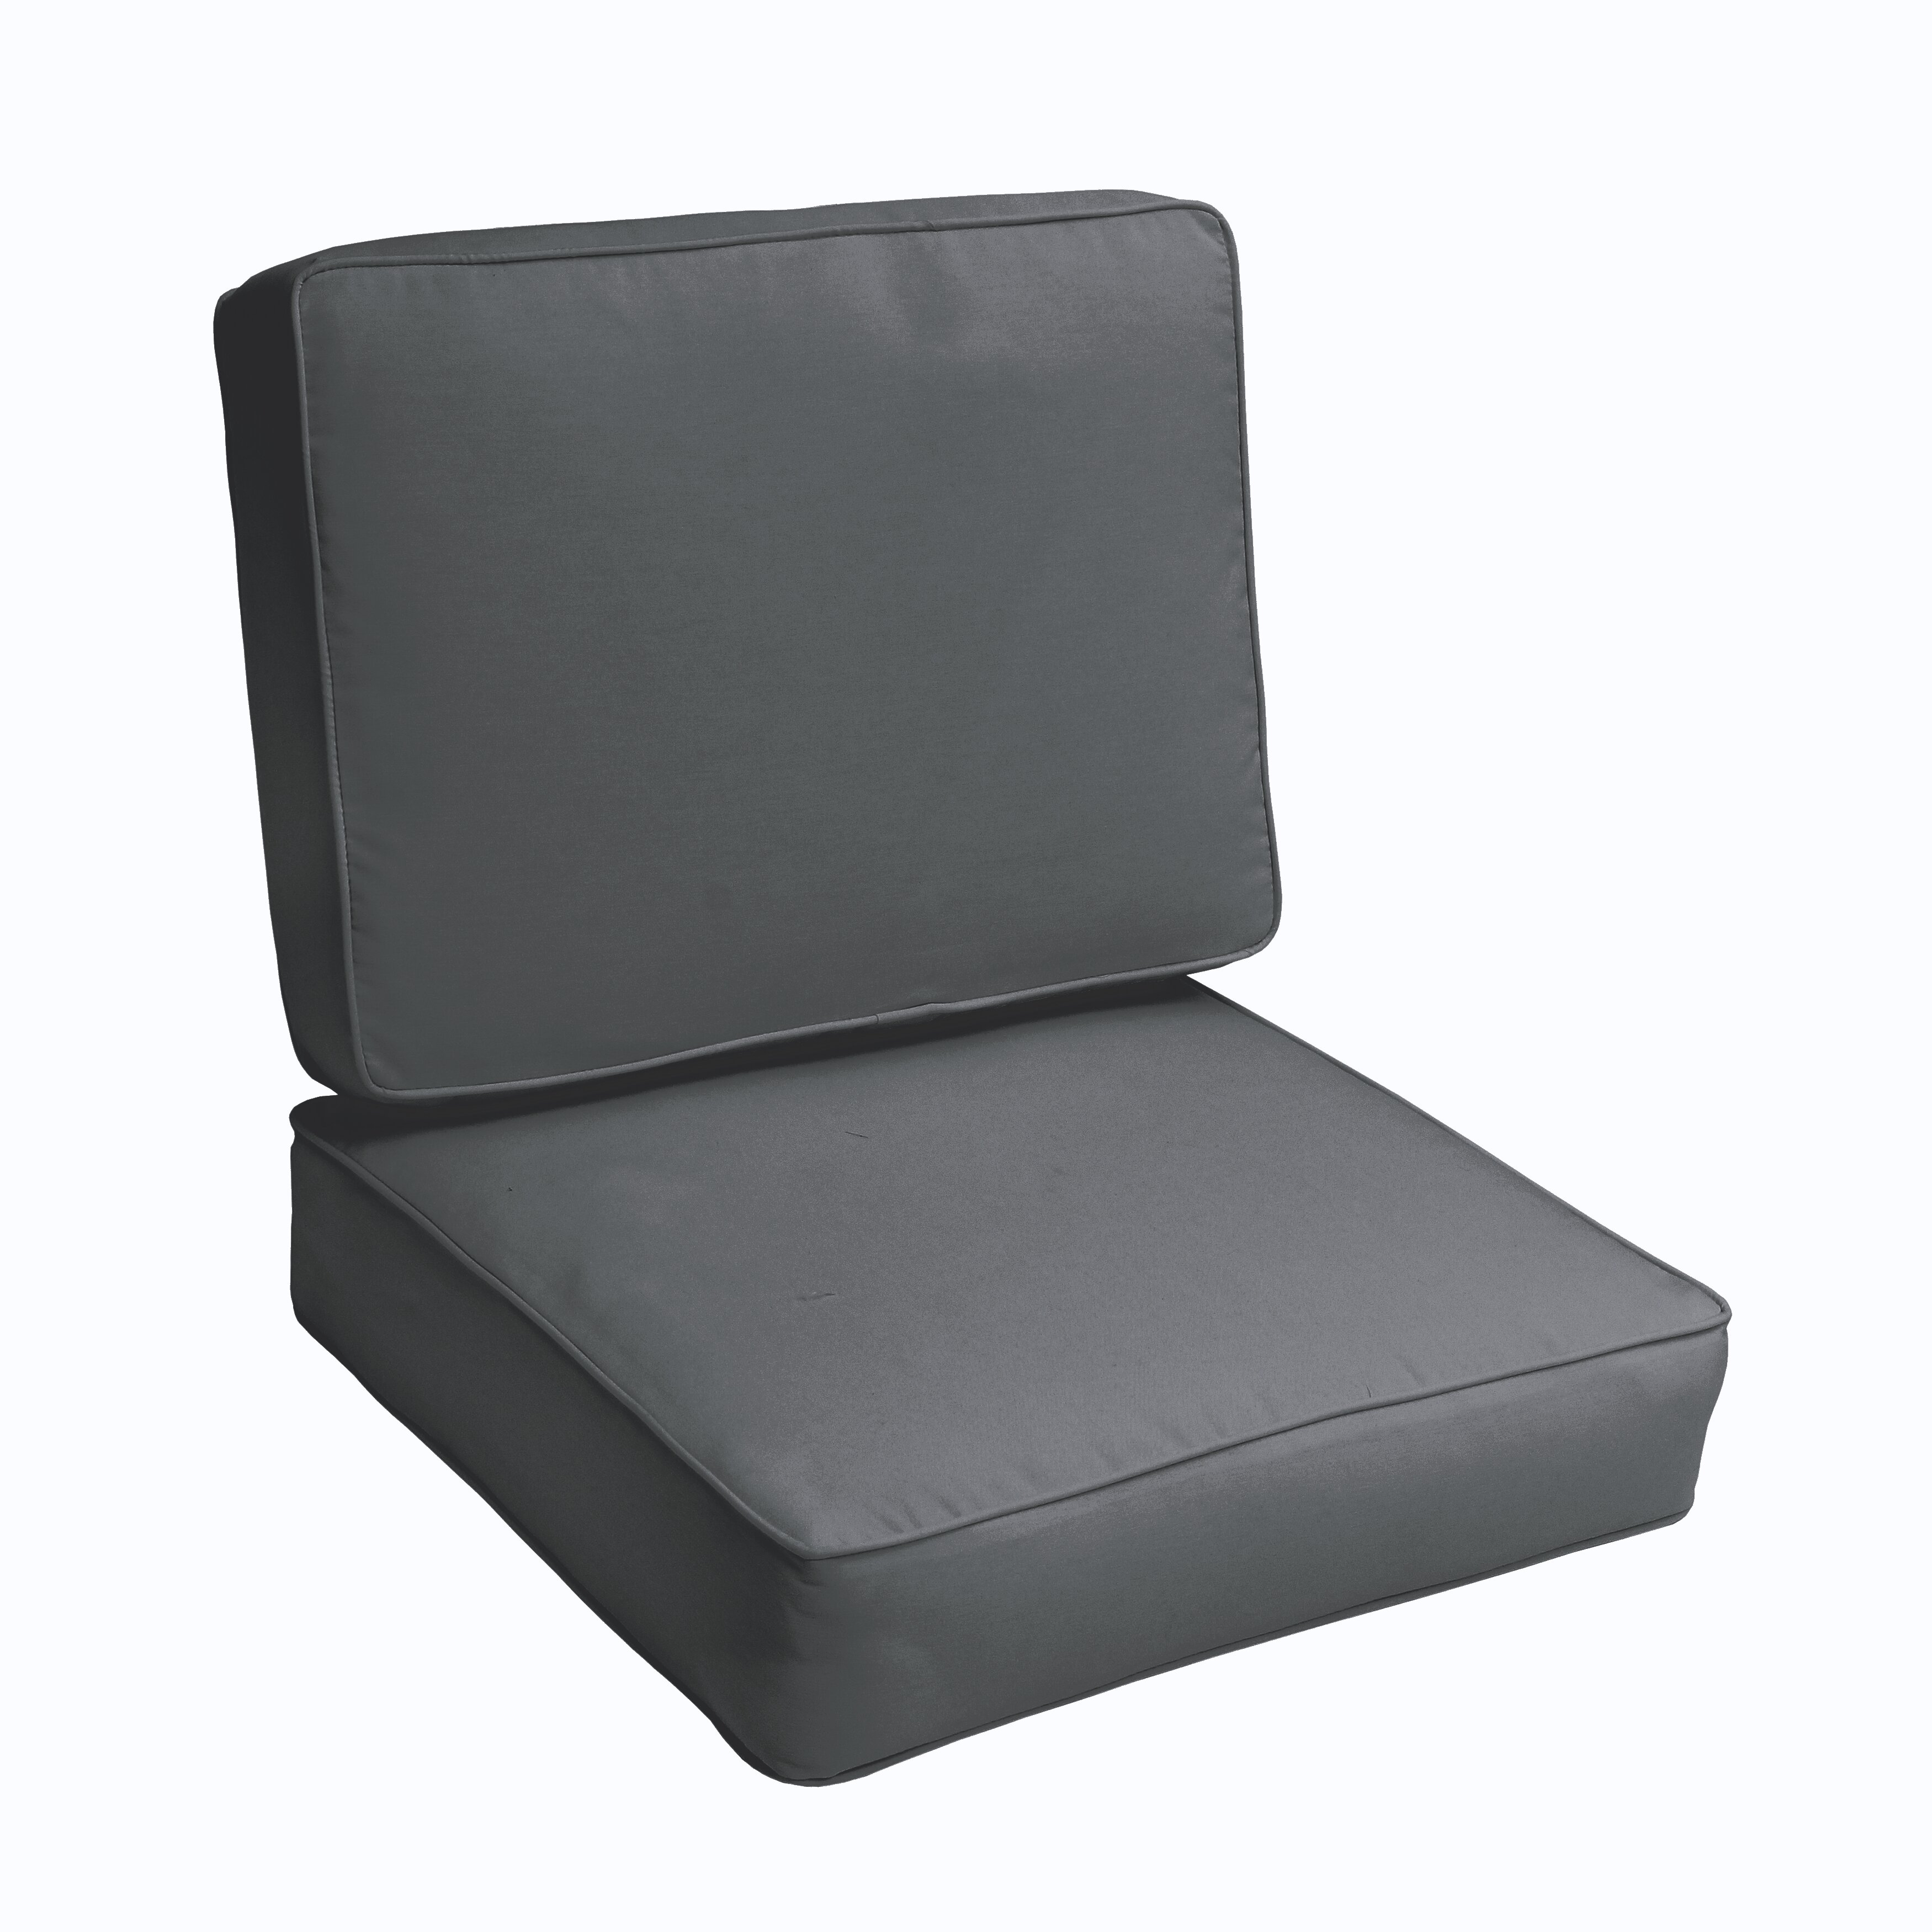 Bay Isle Home Outdoor Lounge Chair Cushion Reviews Wayfair